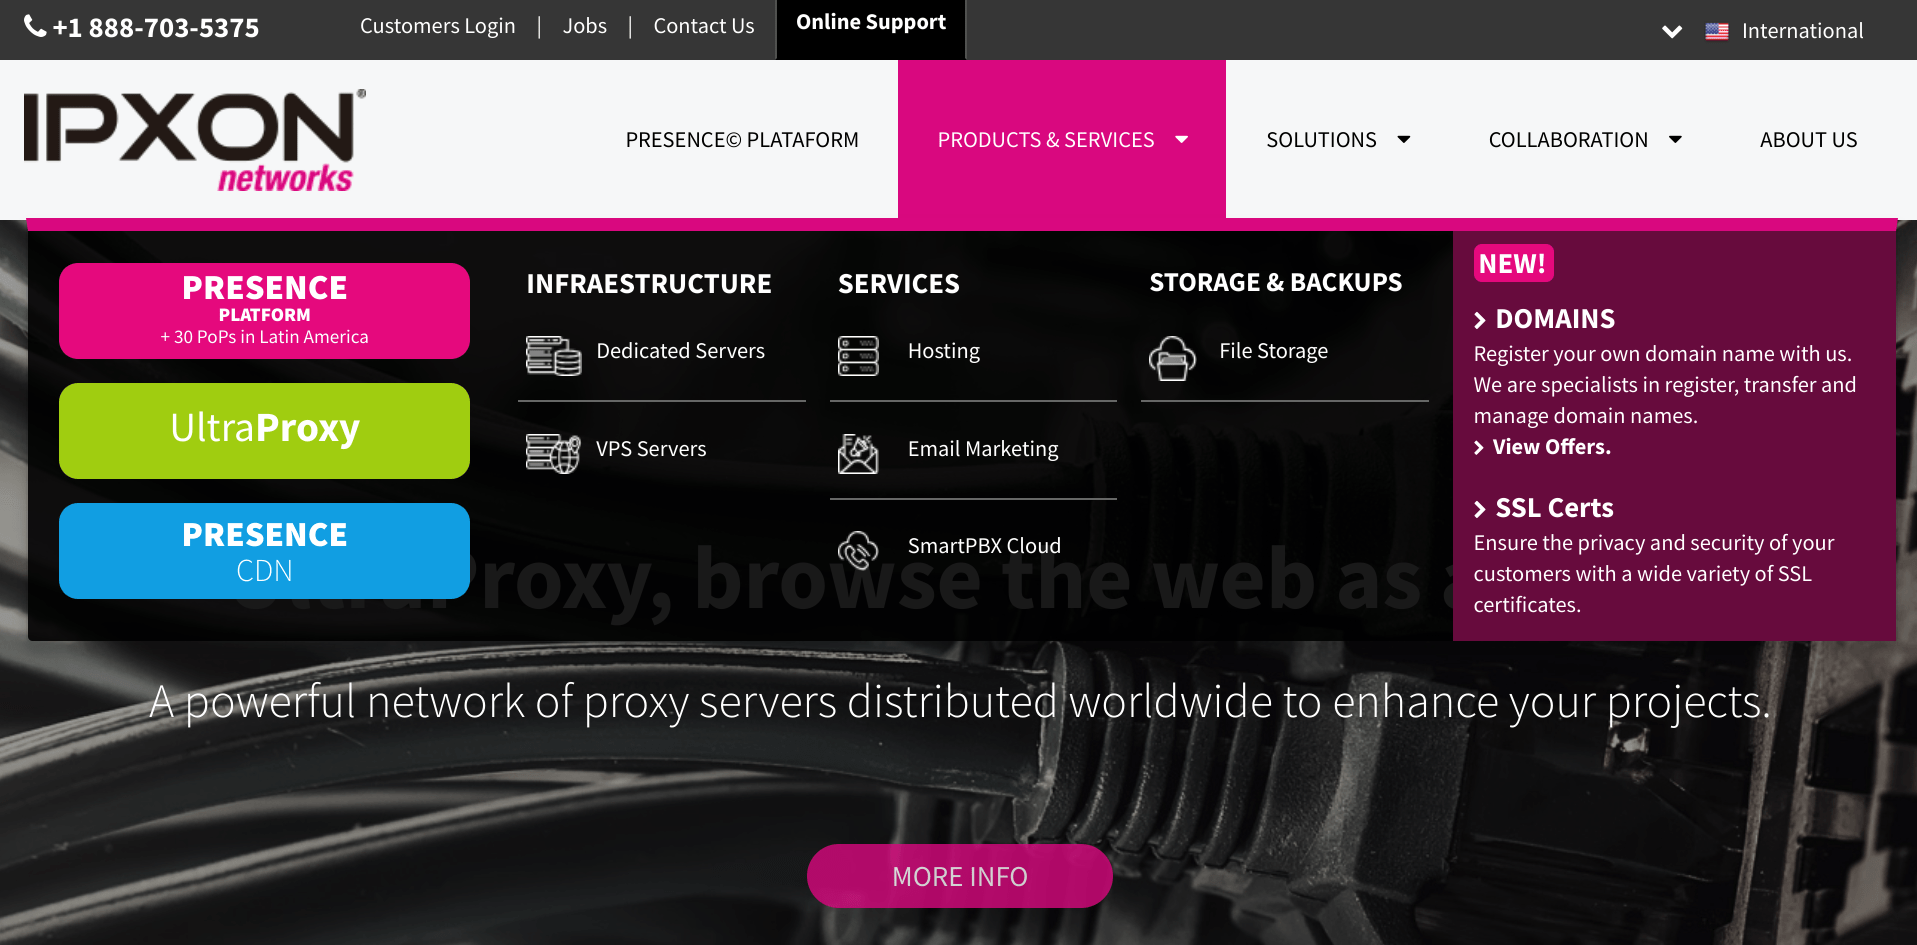 IPXON Networks